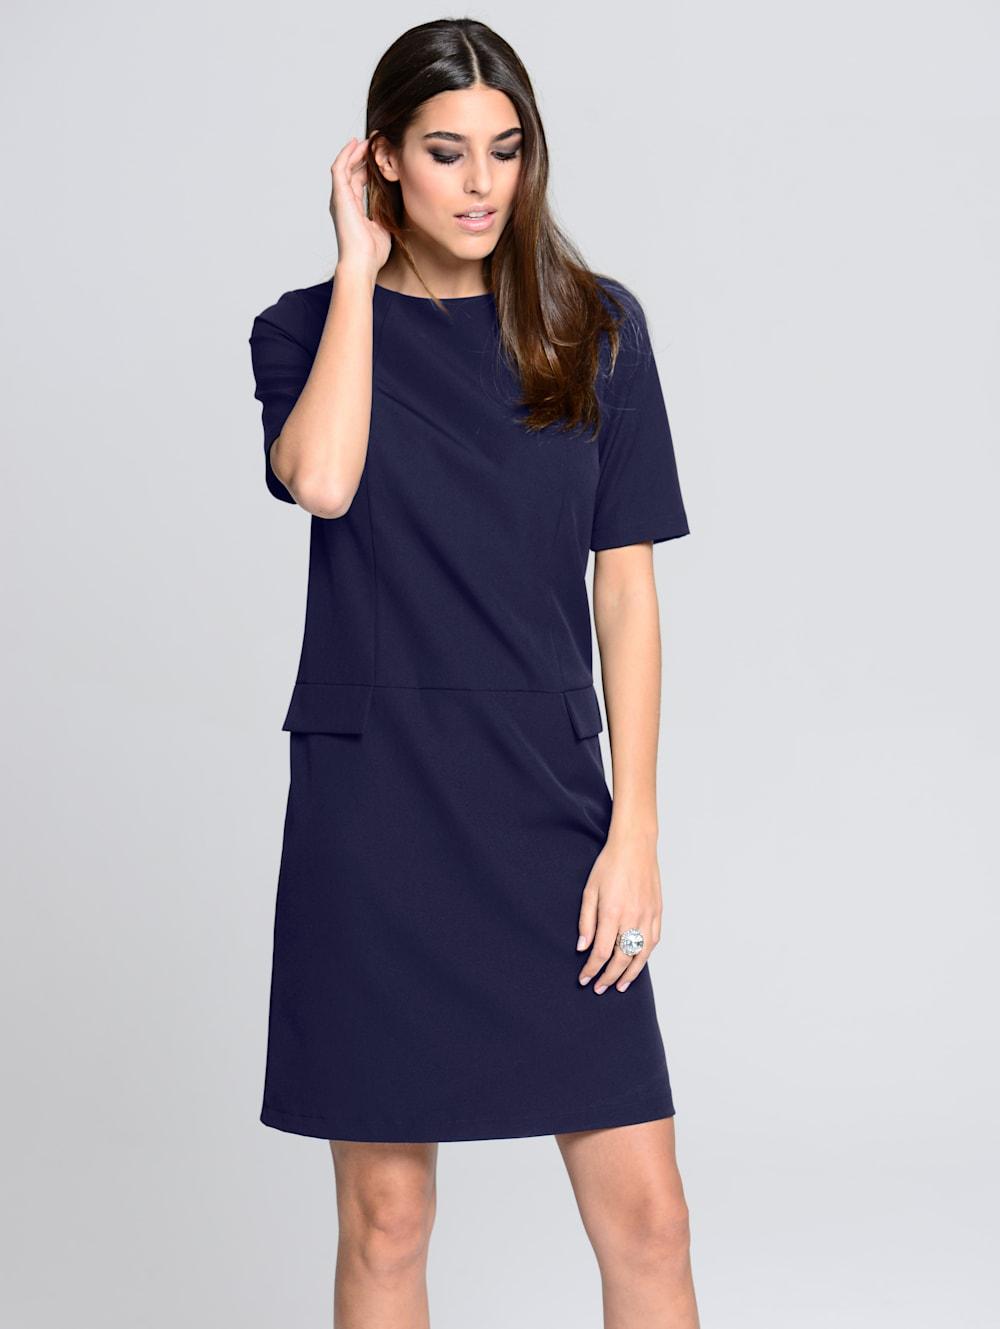 alba moda kleid in leicht kastiger form | alba moda